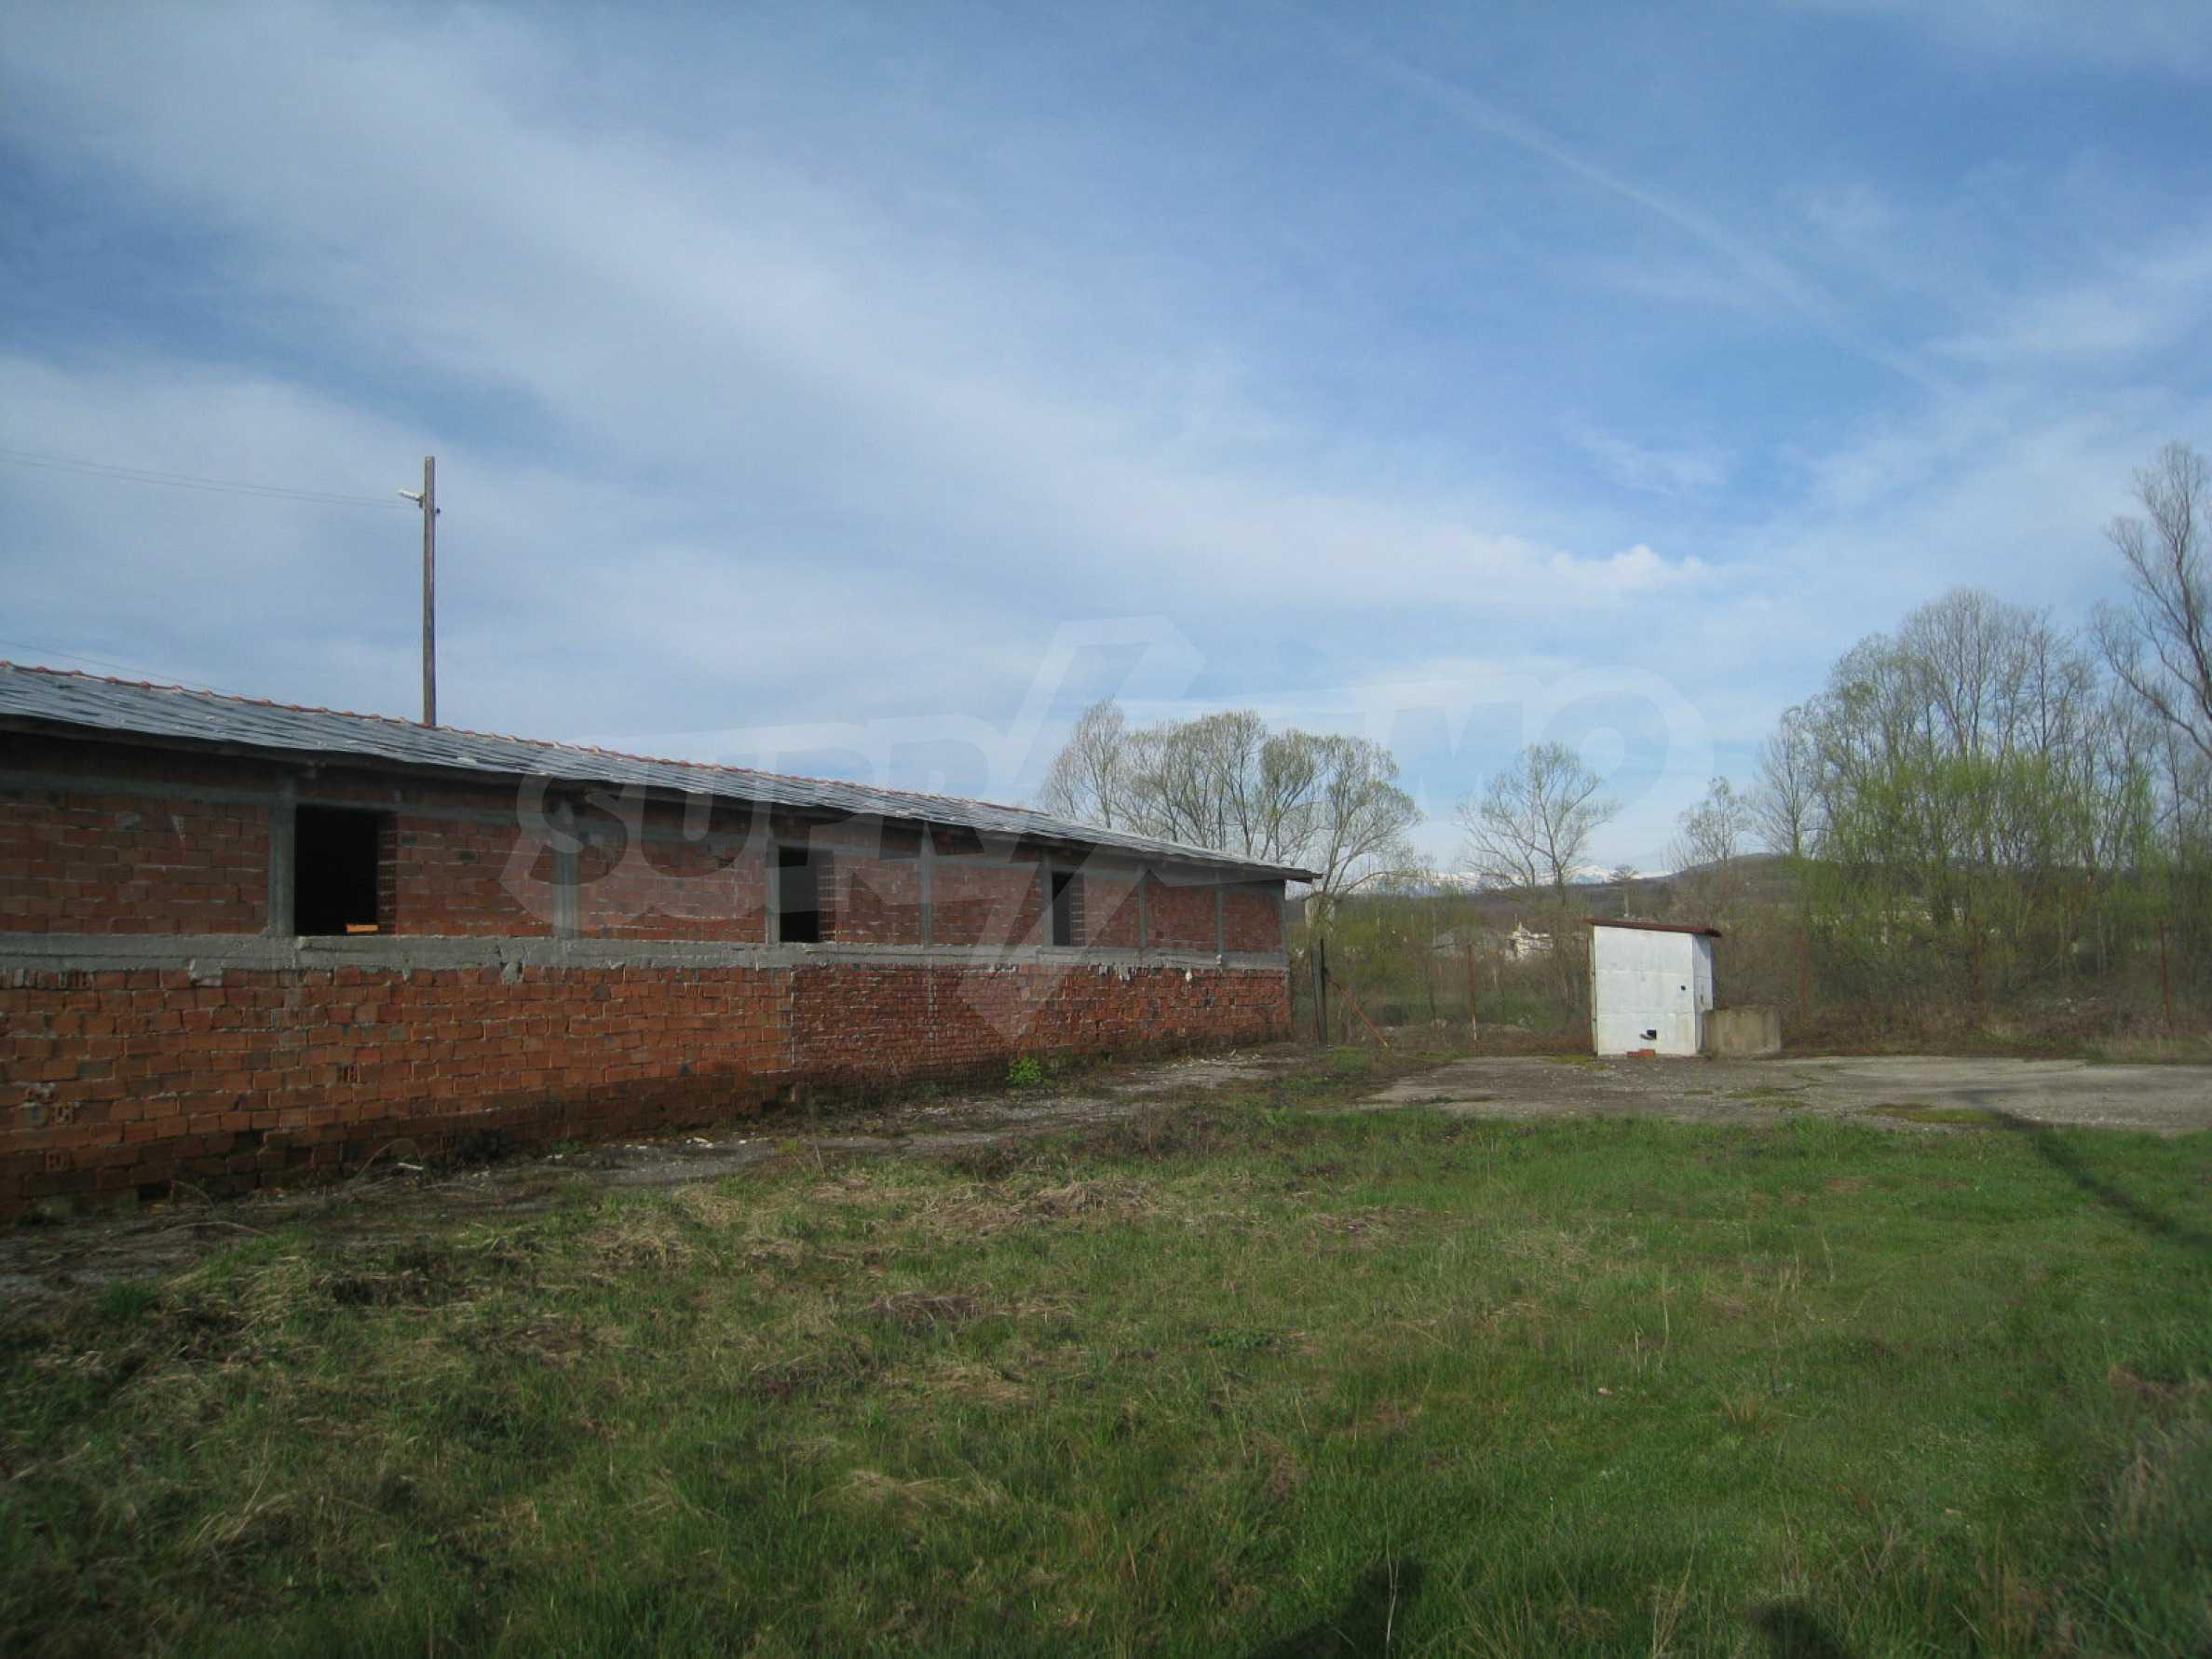 Fishpond, warehouses, residential areas and asphalt ground near Montana 29